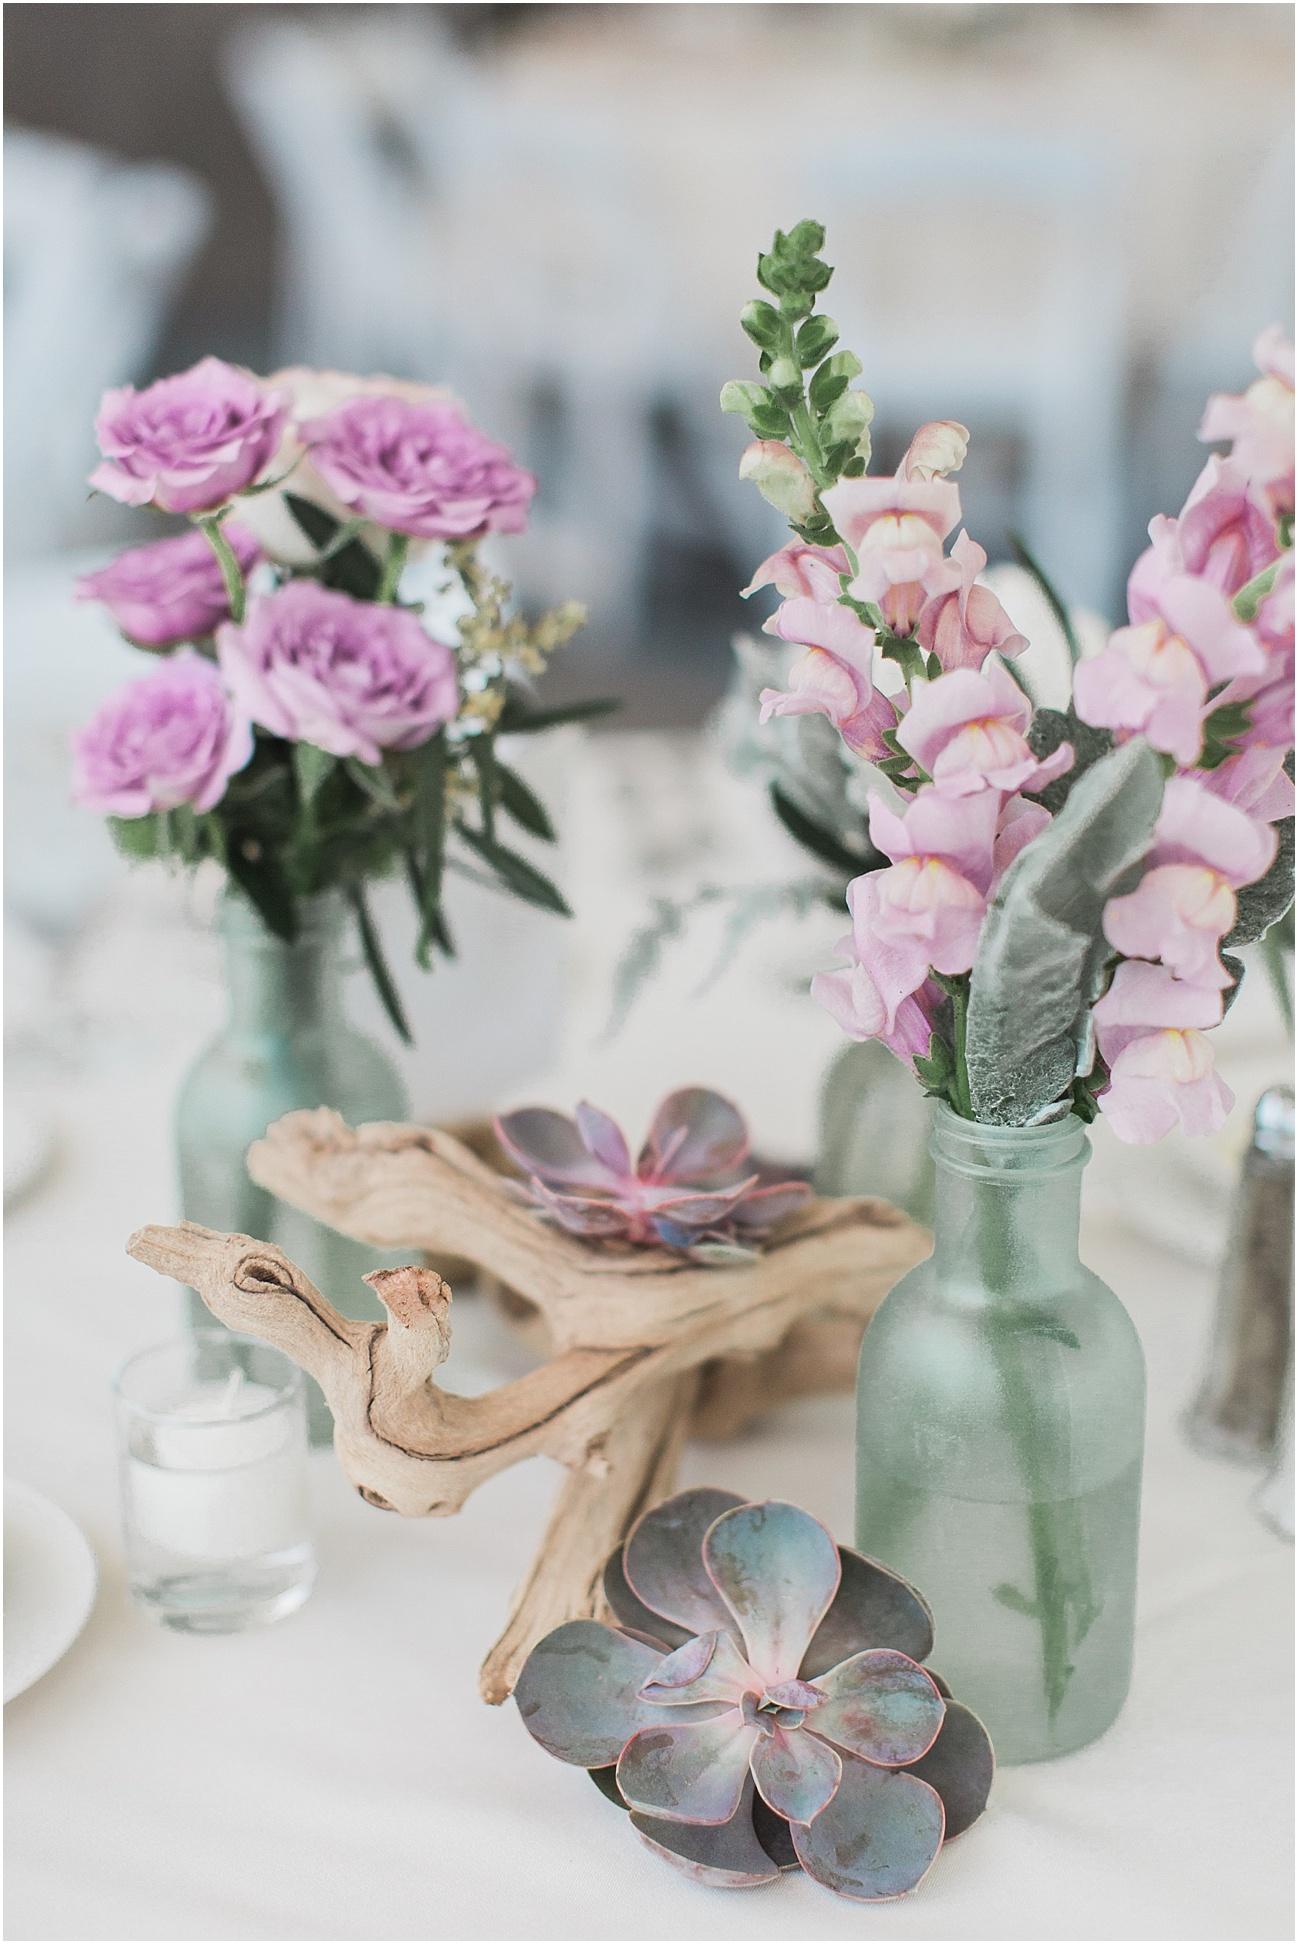 courtney_kurt_cape_cod_popponessett_inn_dowses_beach_boston_wedding_meredith_jane_photography_photo_0059.jpg